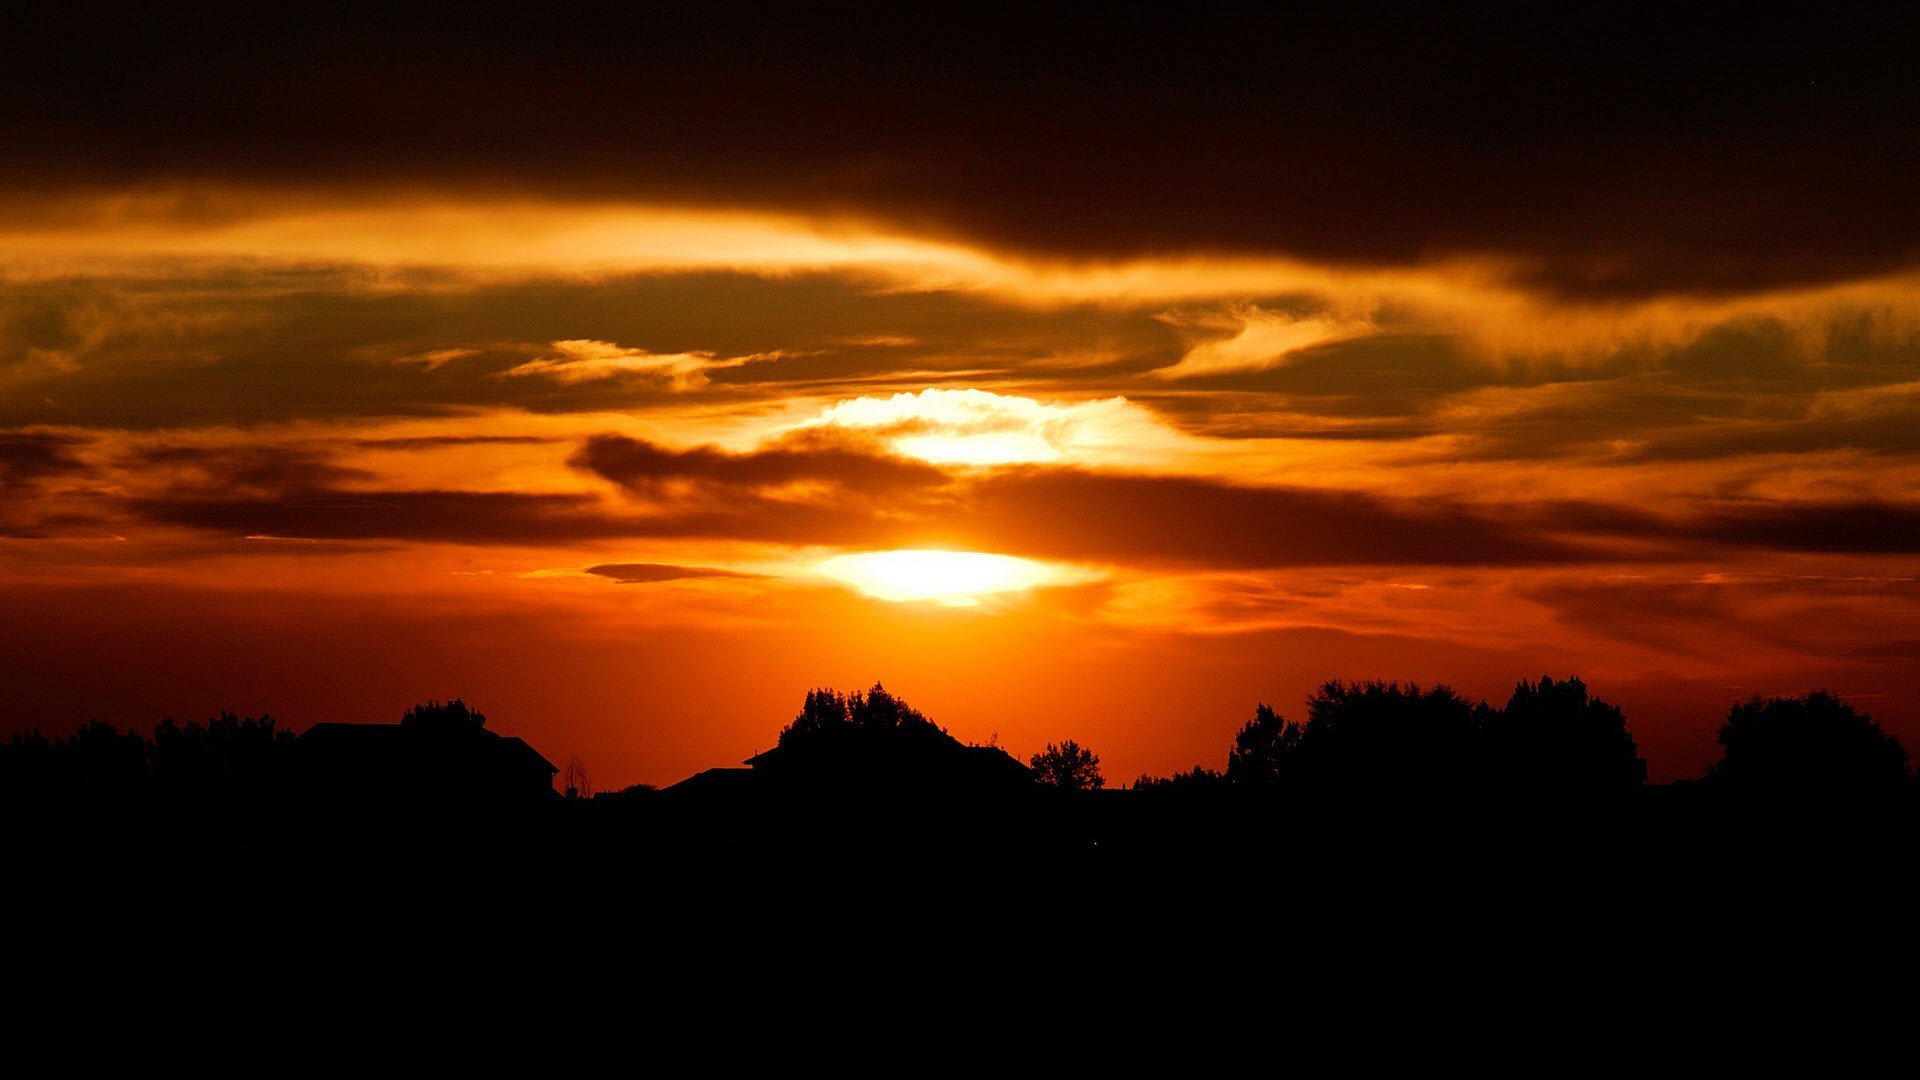 Description Beautiful Sunset Wallpaper is a hi res Wallpaper for pc 1920x1080